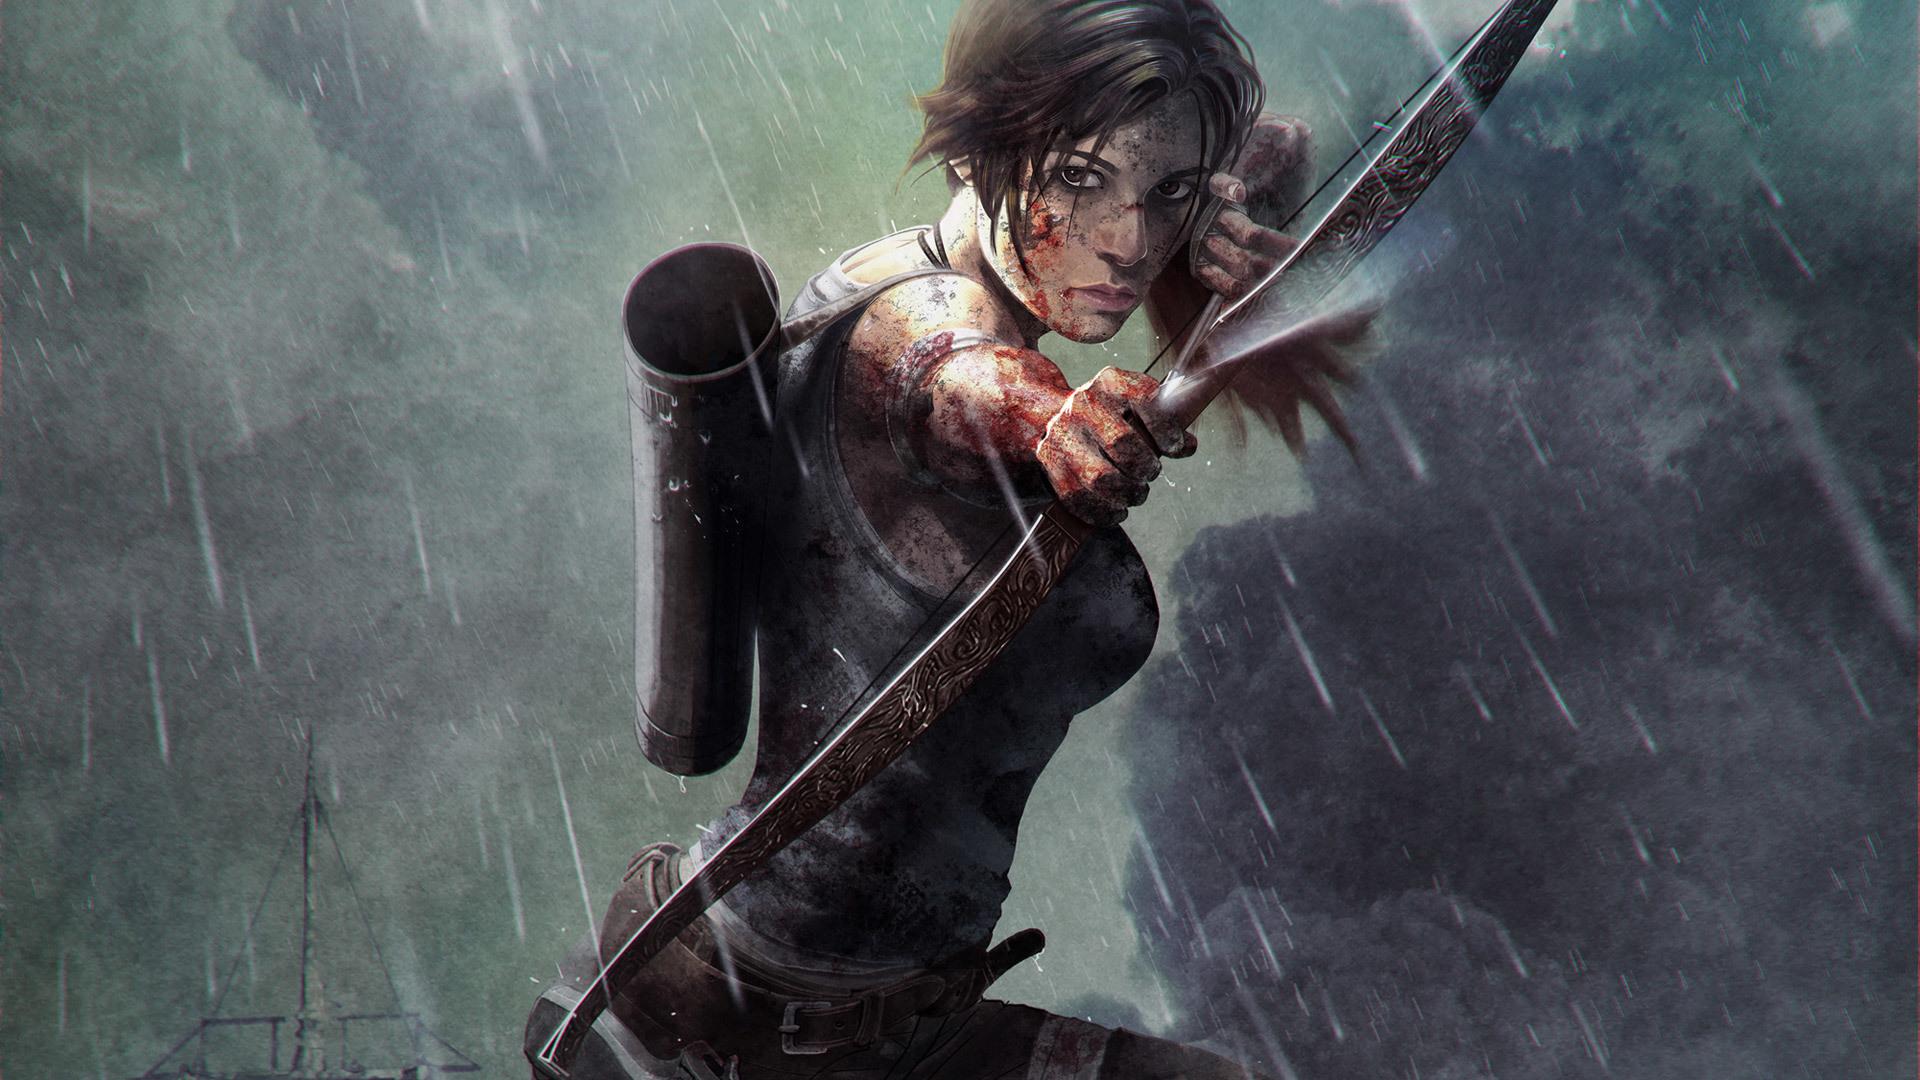 Tomb Raider 2013 Archers Warriors Rain Games Girls rain wallpaper 1920x1080